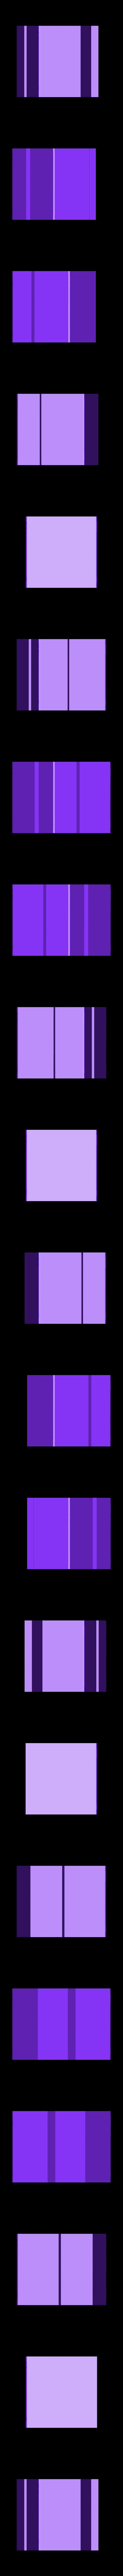 Body2.stl Download STL file Square it! • 3D printer template, Log5